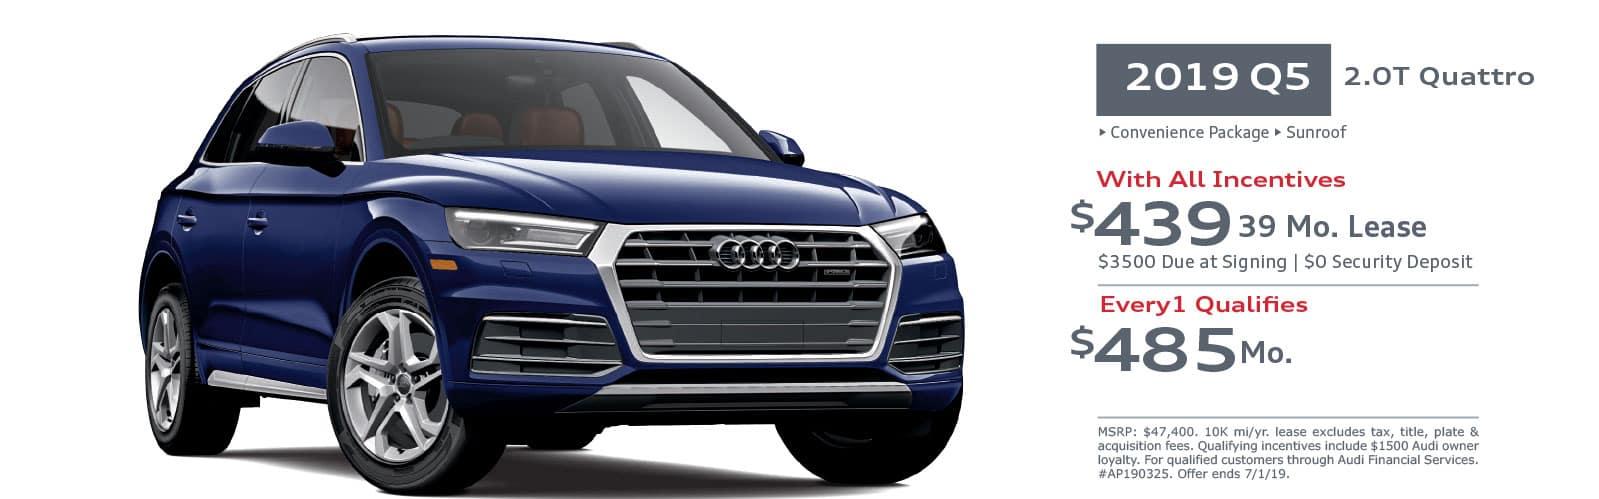 Audi Lease Deals >> Audi Lease Deals Washington New Car Lease Specials Pittsburgh